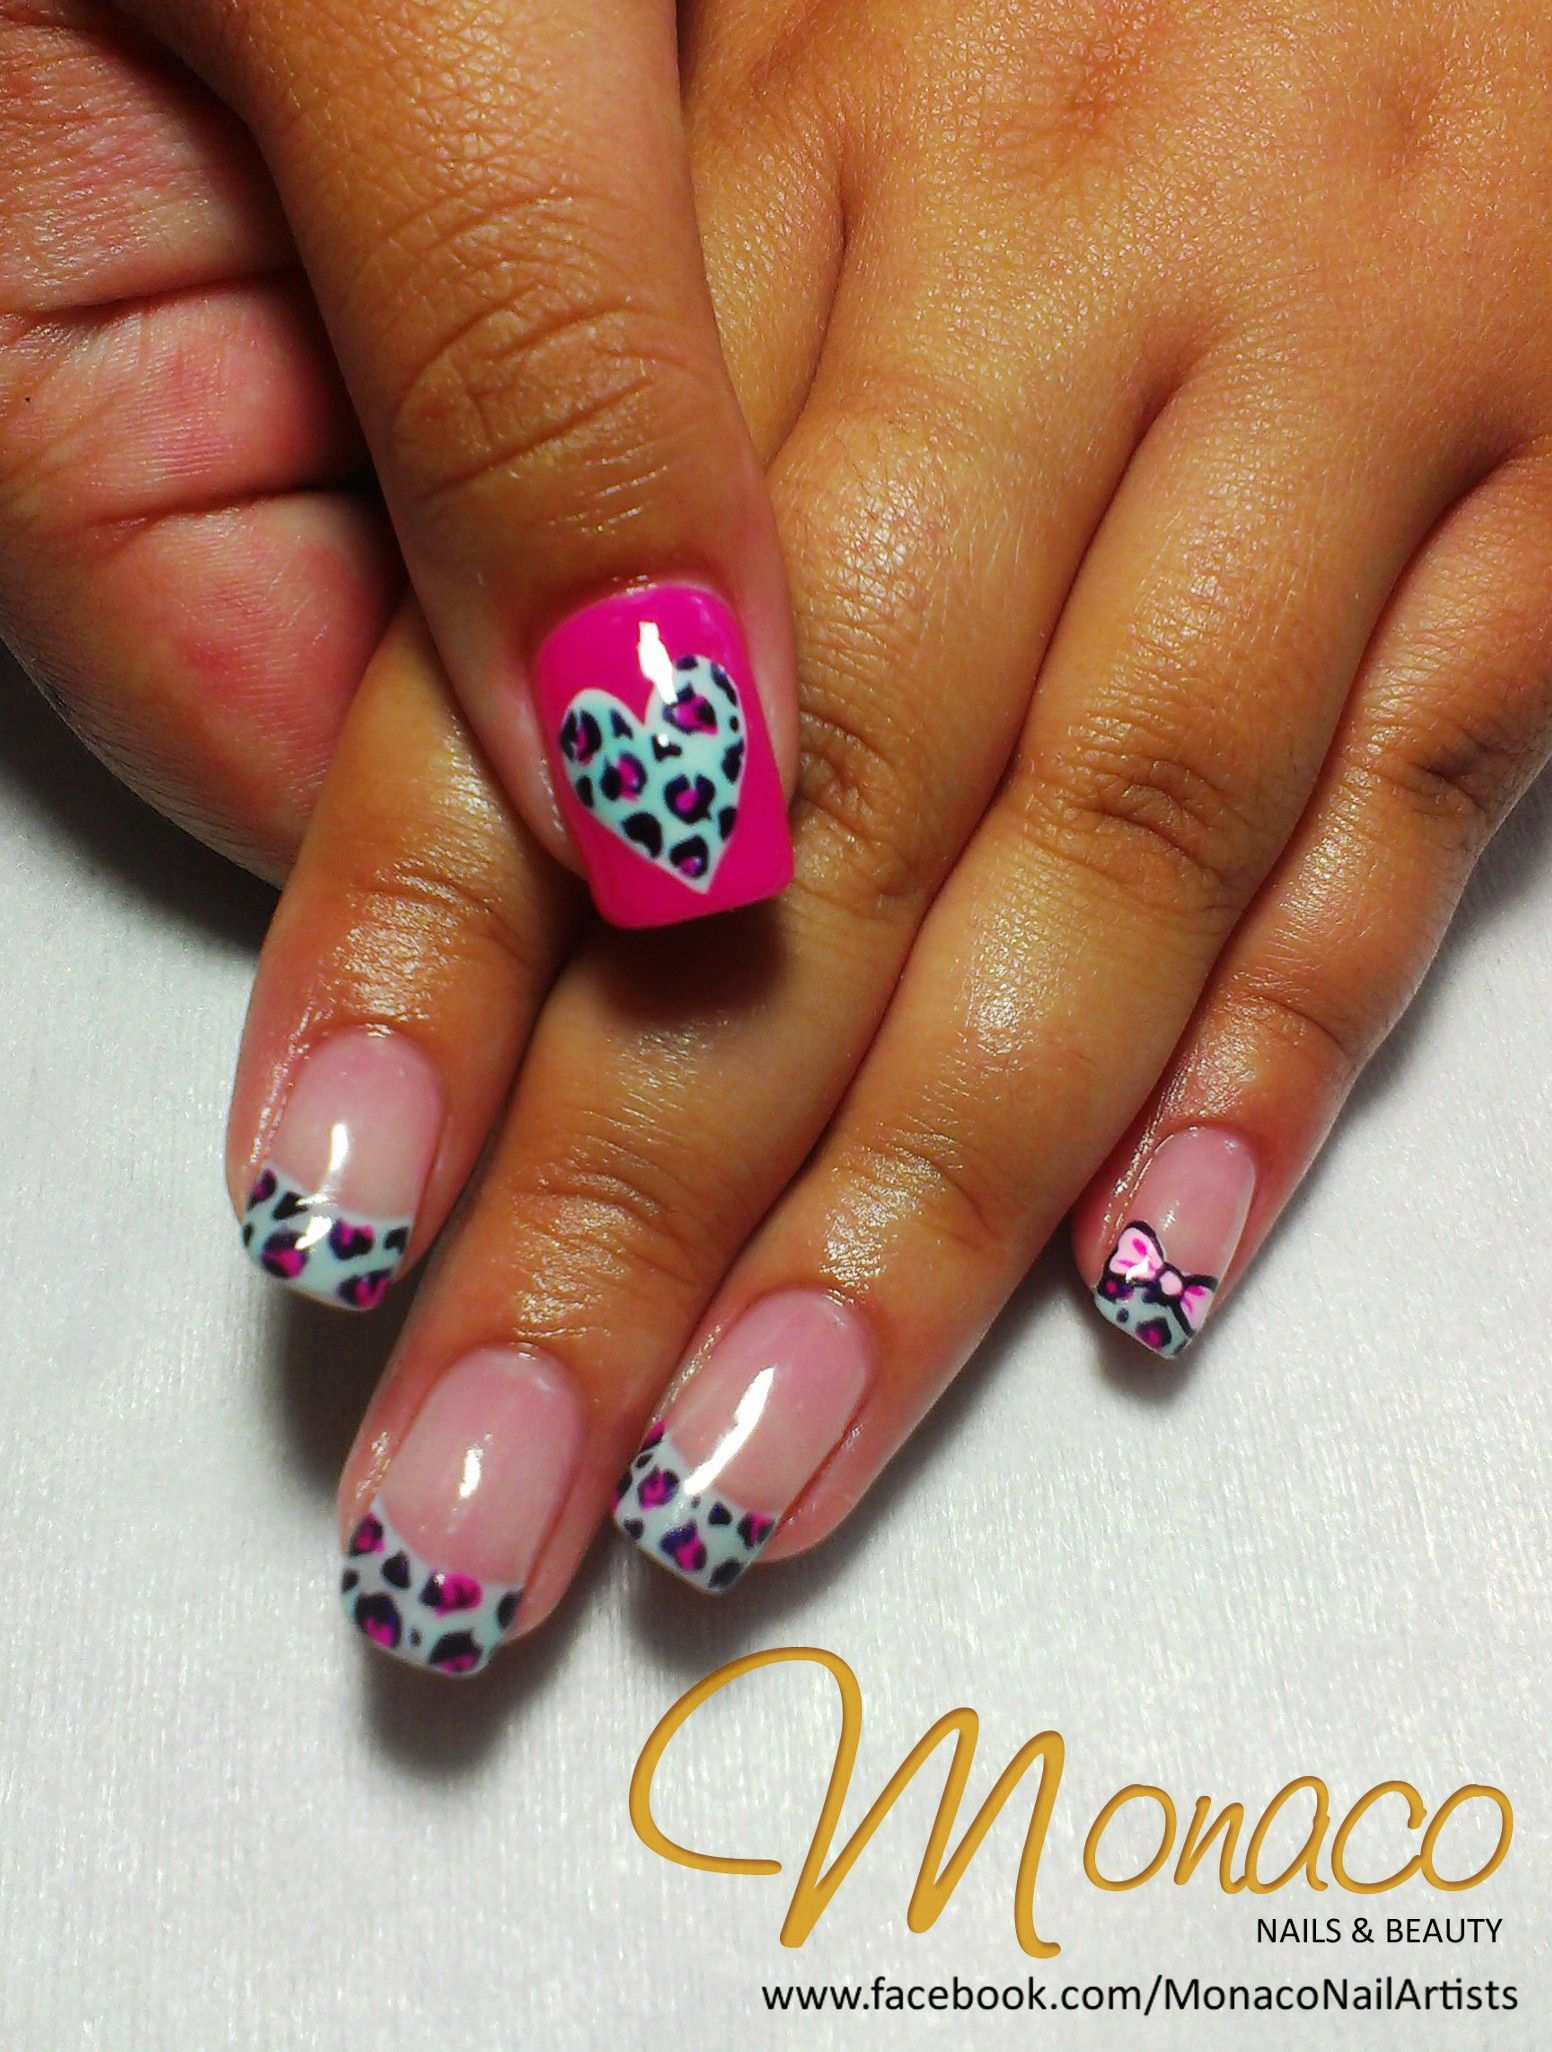 Naomis Leopard Colour Gloss Nails! Love Pink Spots